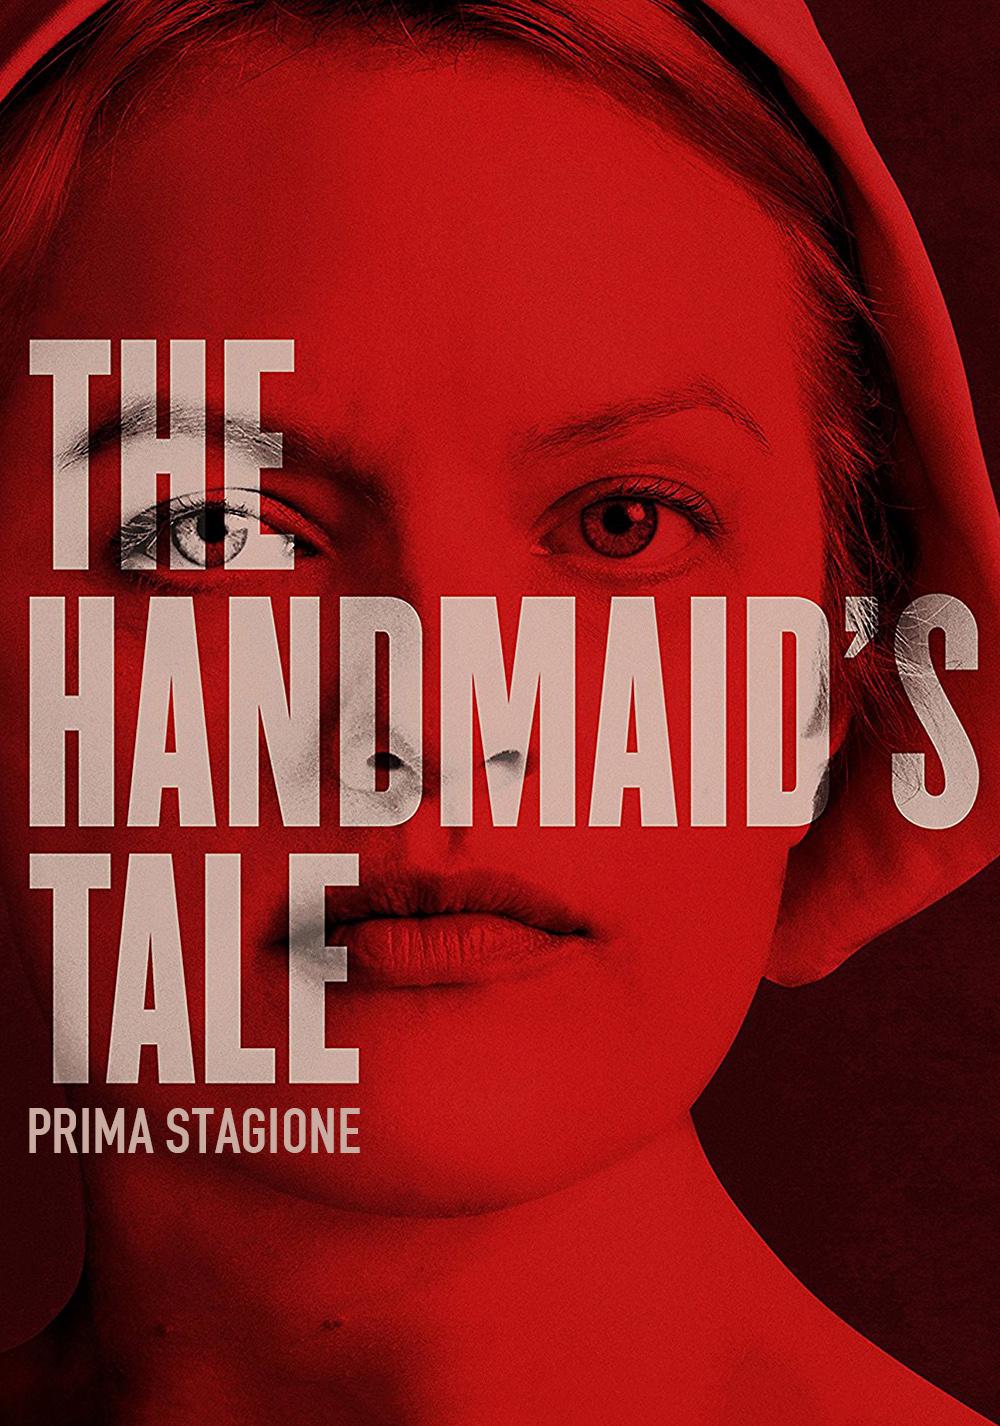 The HandmaidS Tale Serie